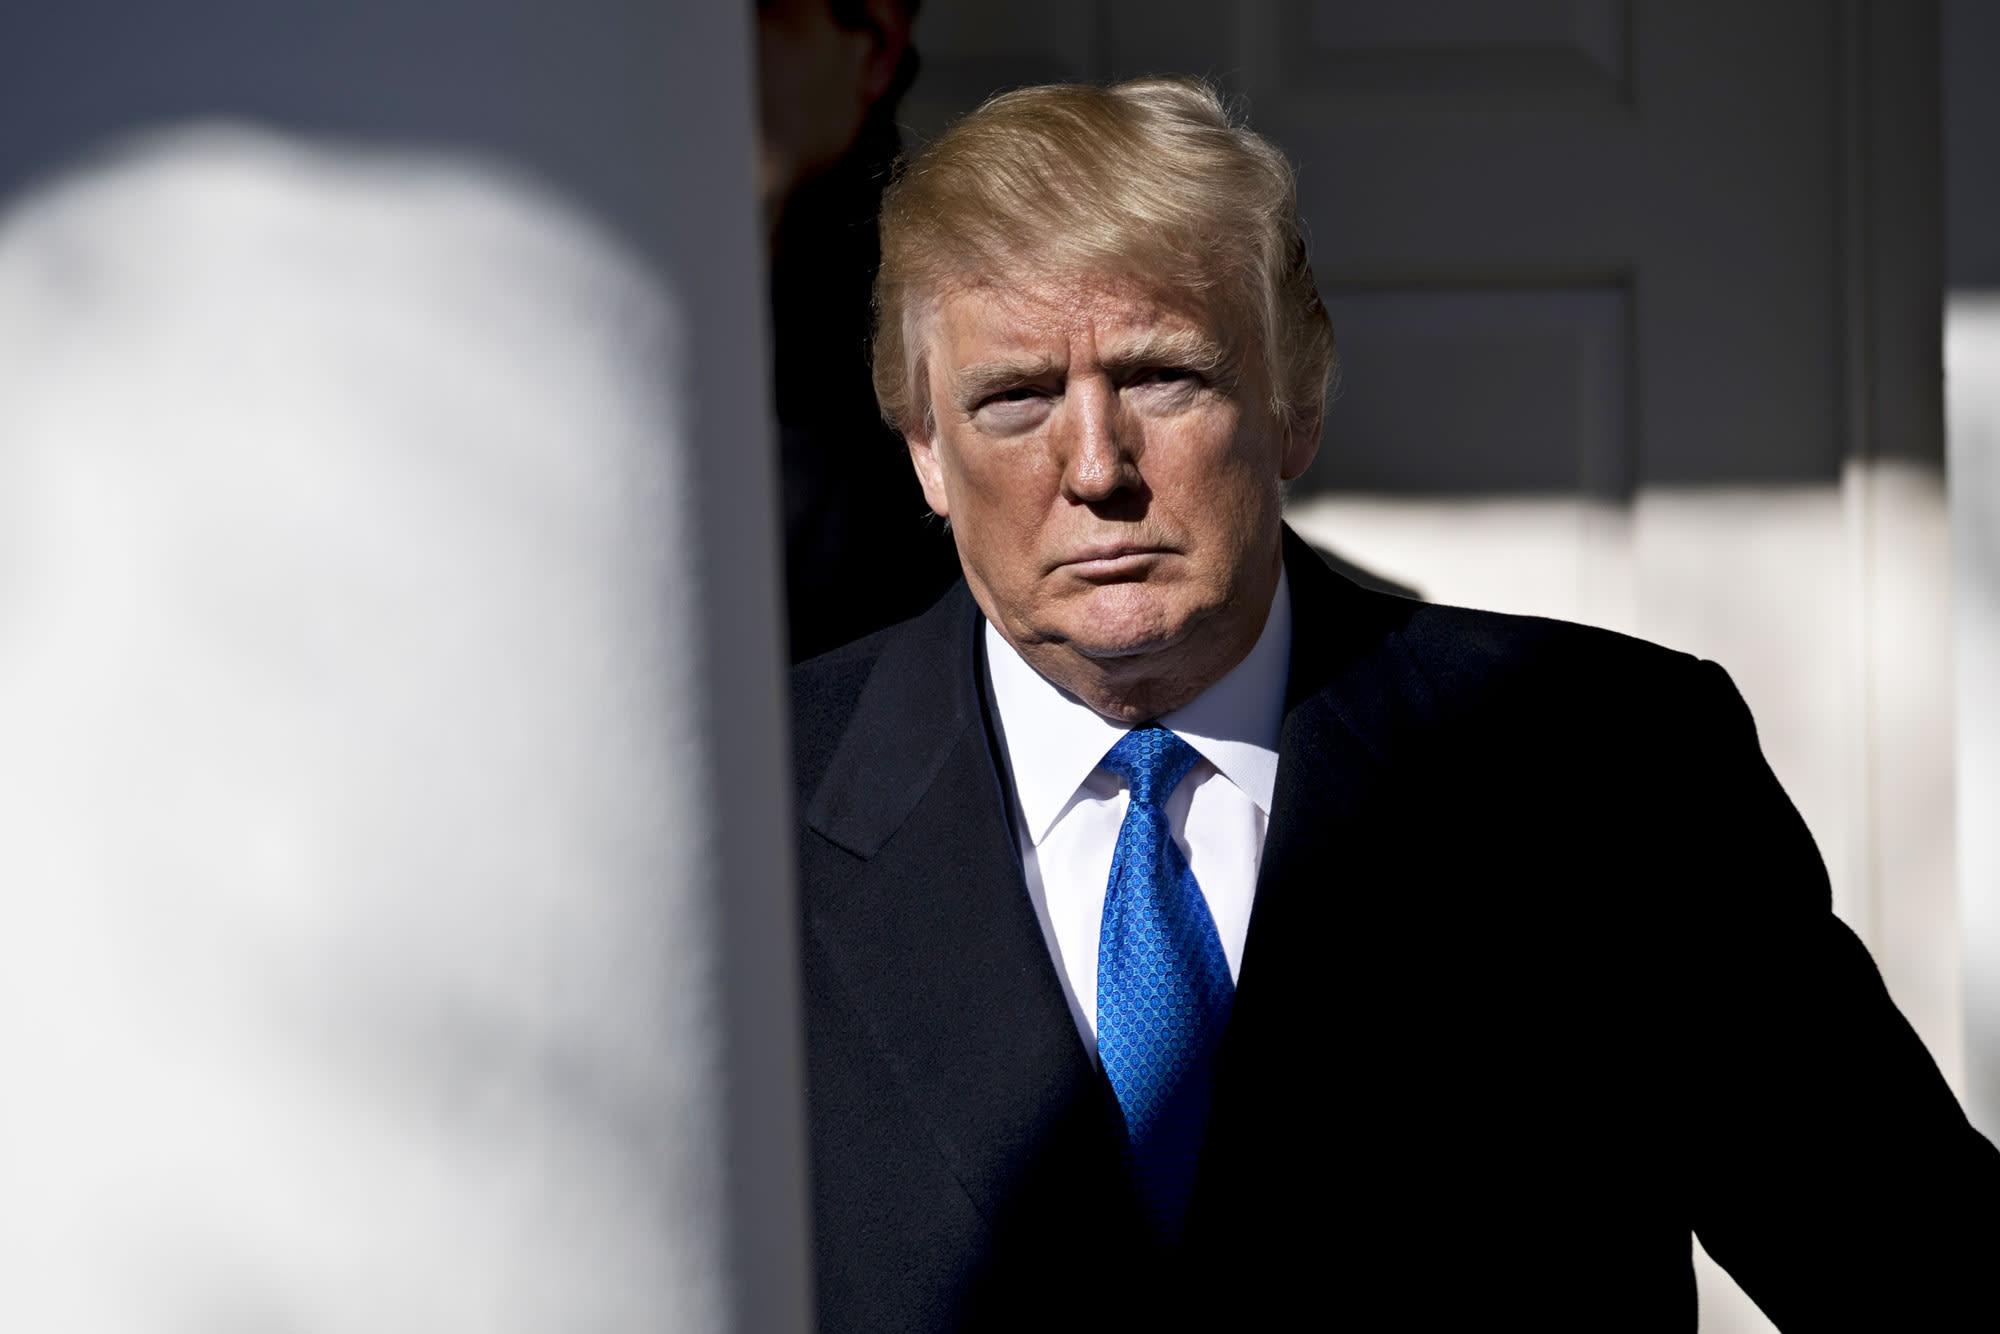 Trump faces criminal, civil investigations after White House